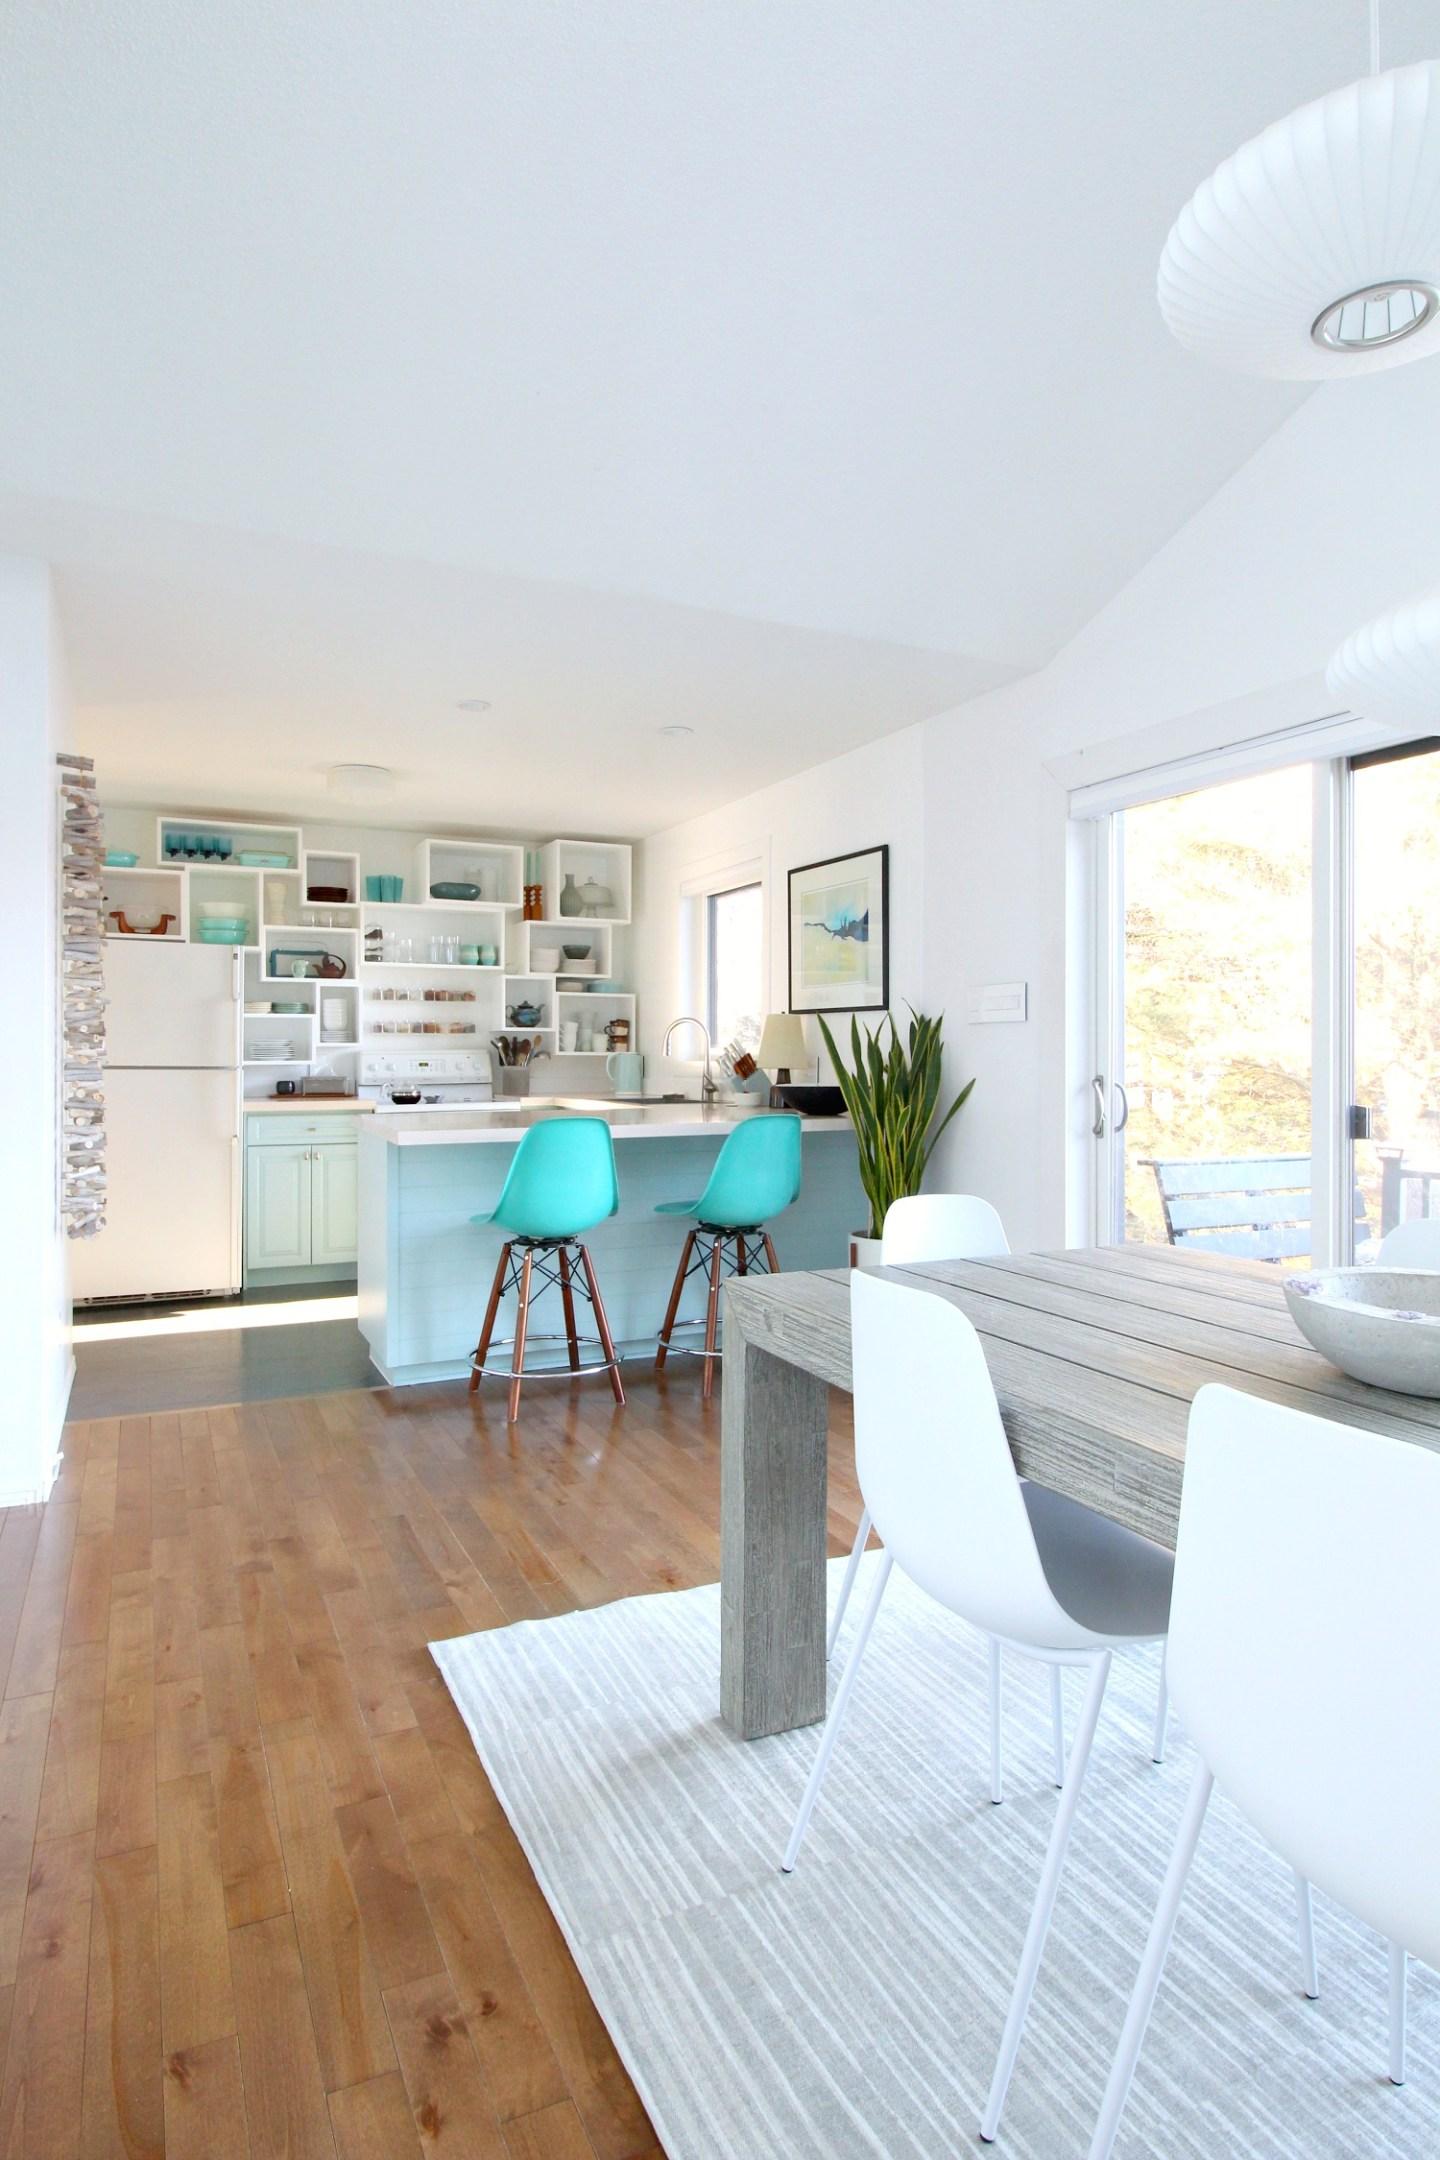 Light and Airy Coastal Kitchen Design